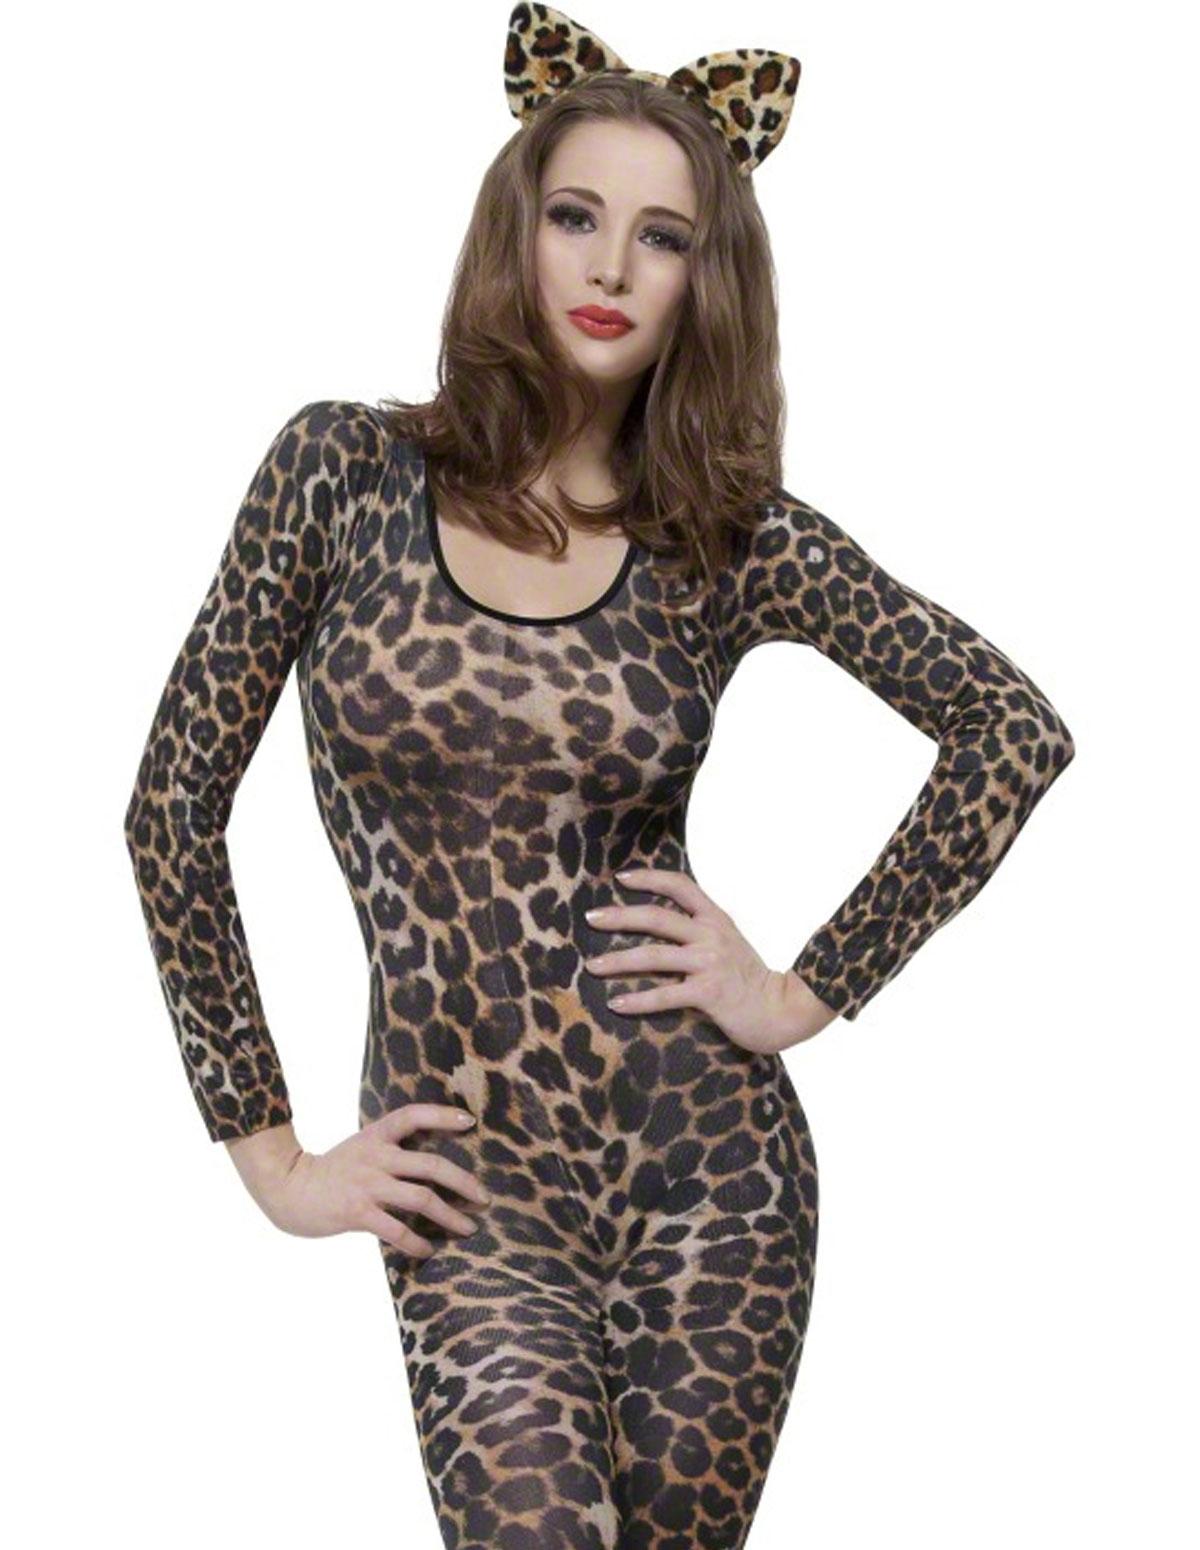 Cheetah Fever Bodystocking